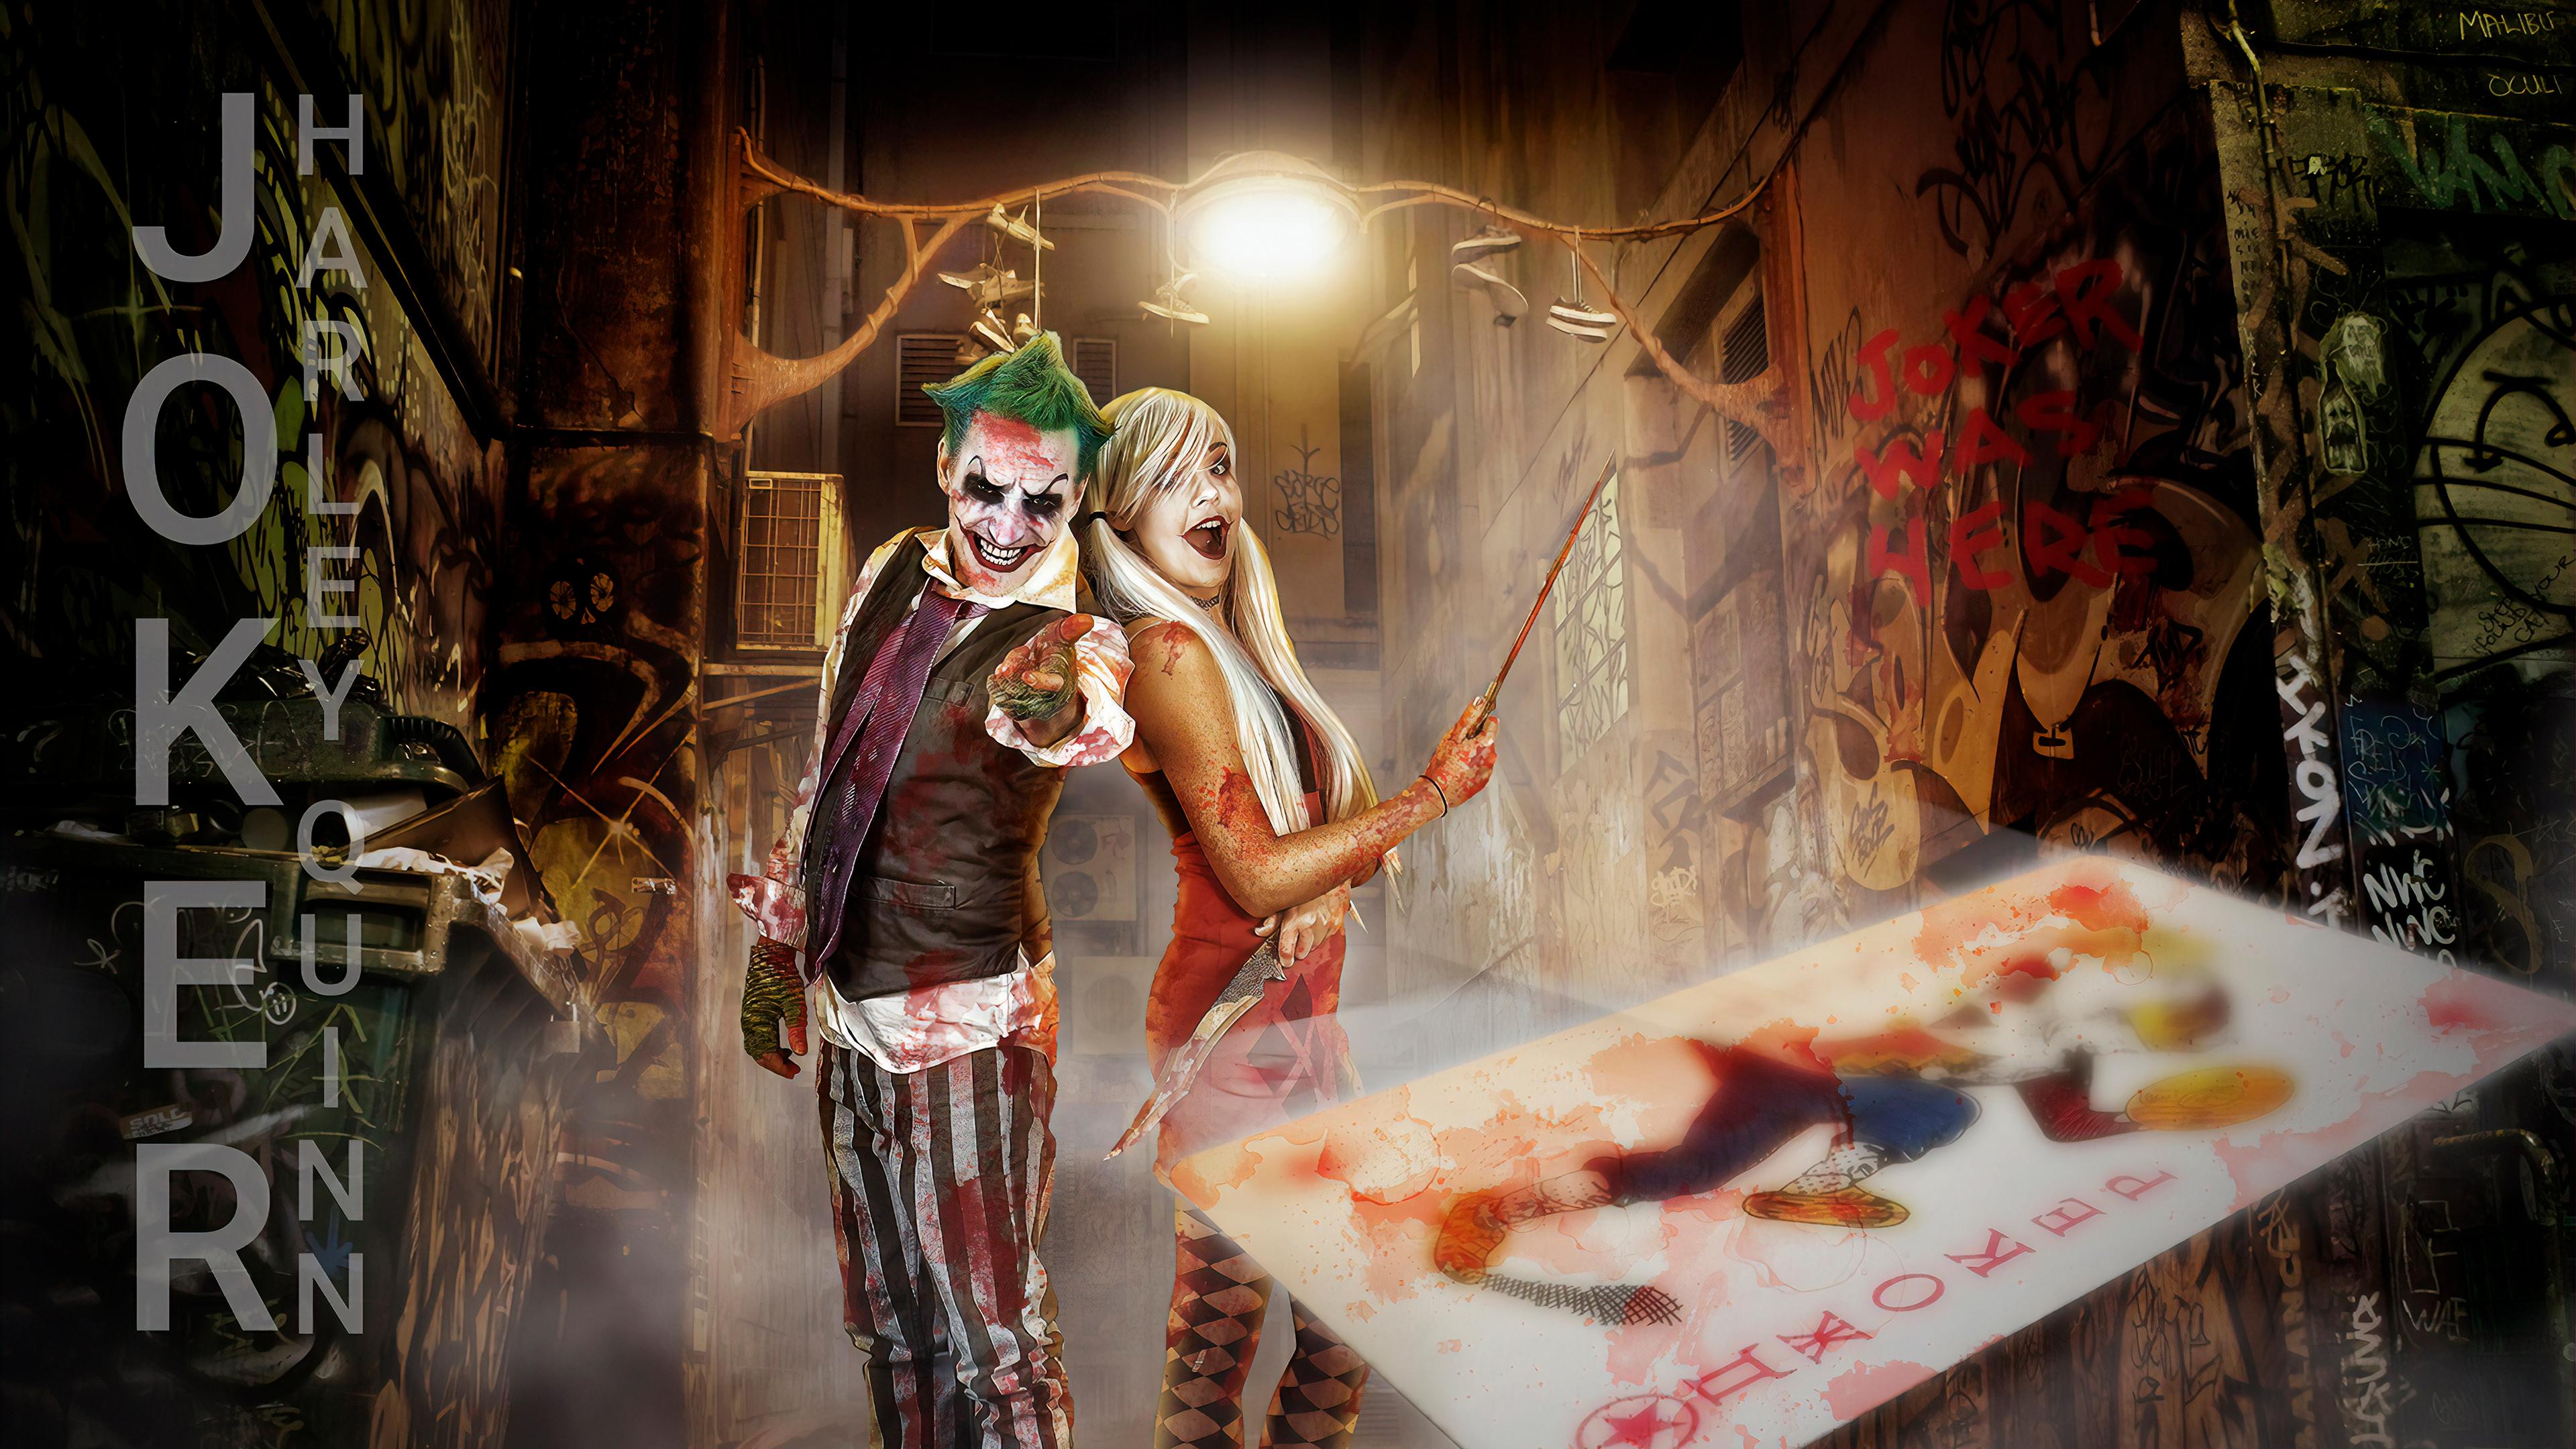 Wallpaper Harley Quinn Joker